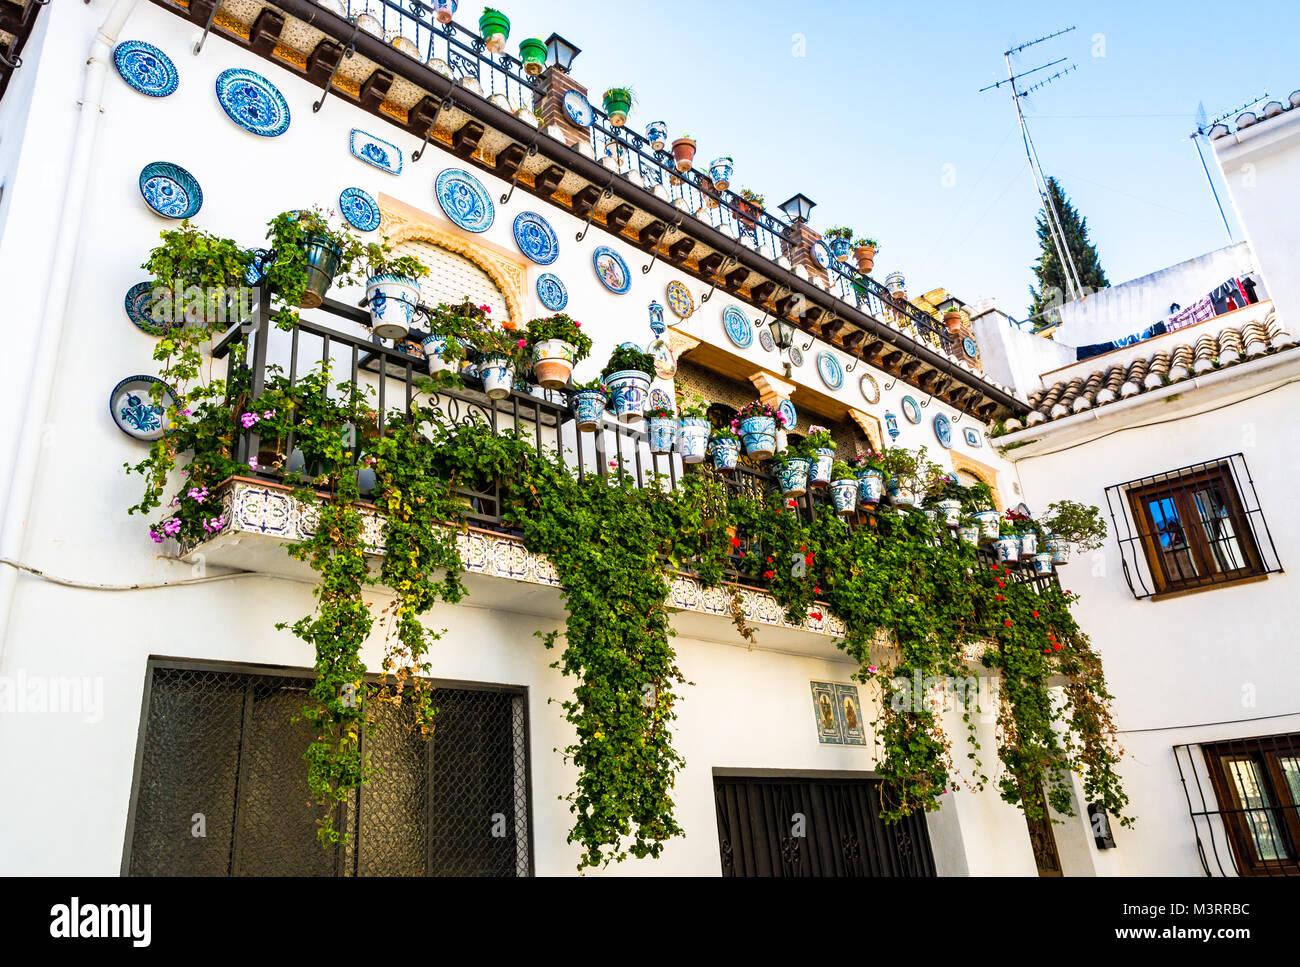 Granada spagna facciata di una casa tradizionale con una - Facciata di una casa ...